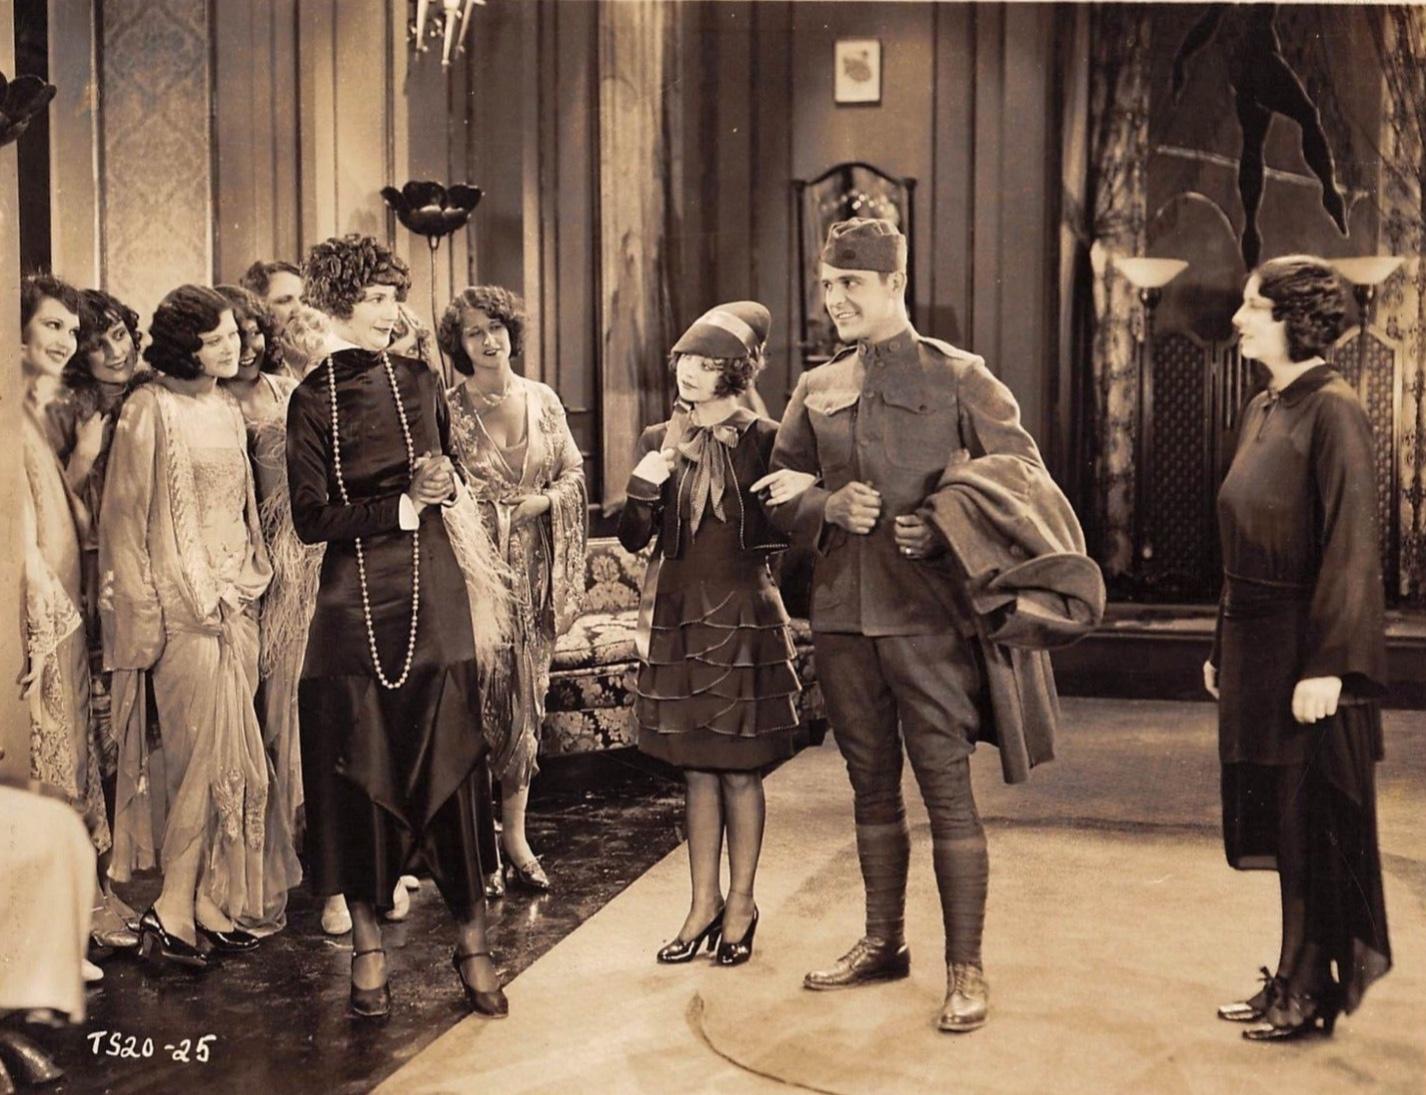 Malcolm McGregor and Alice White in Lingerie (1928)